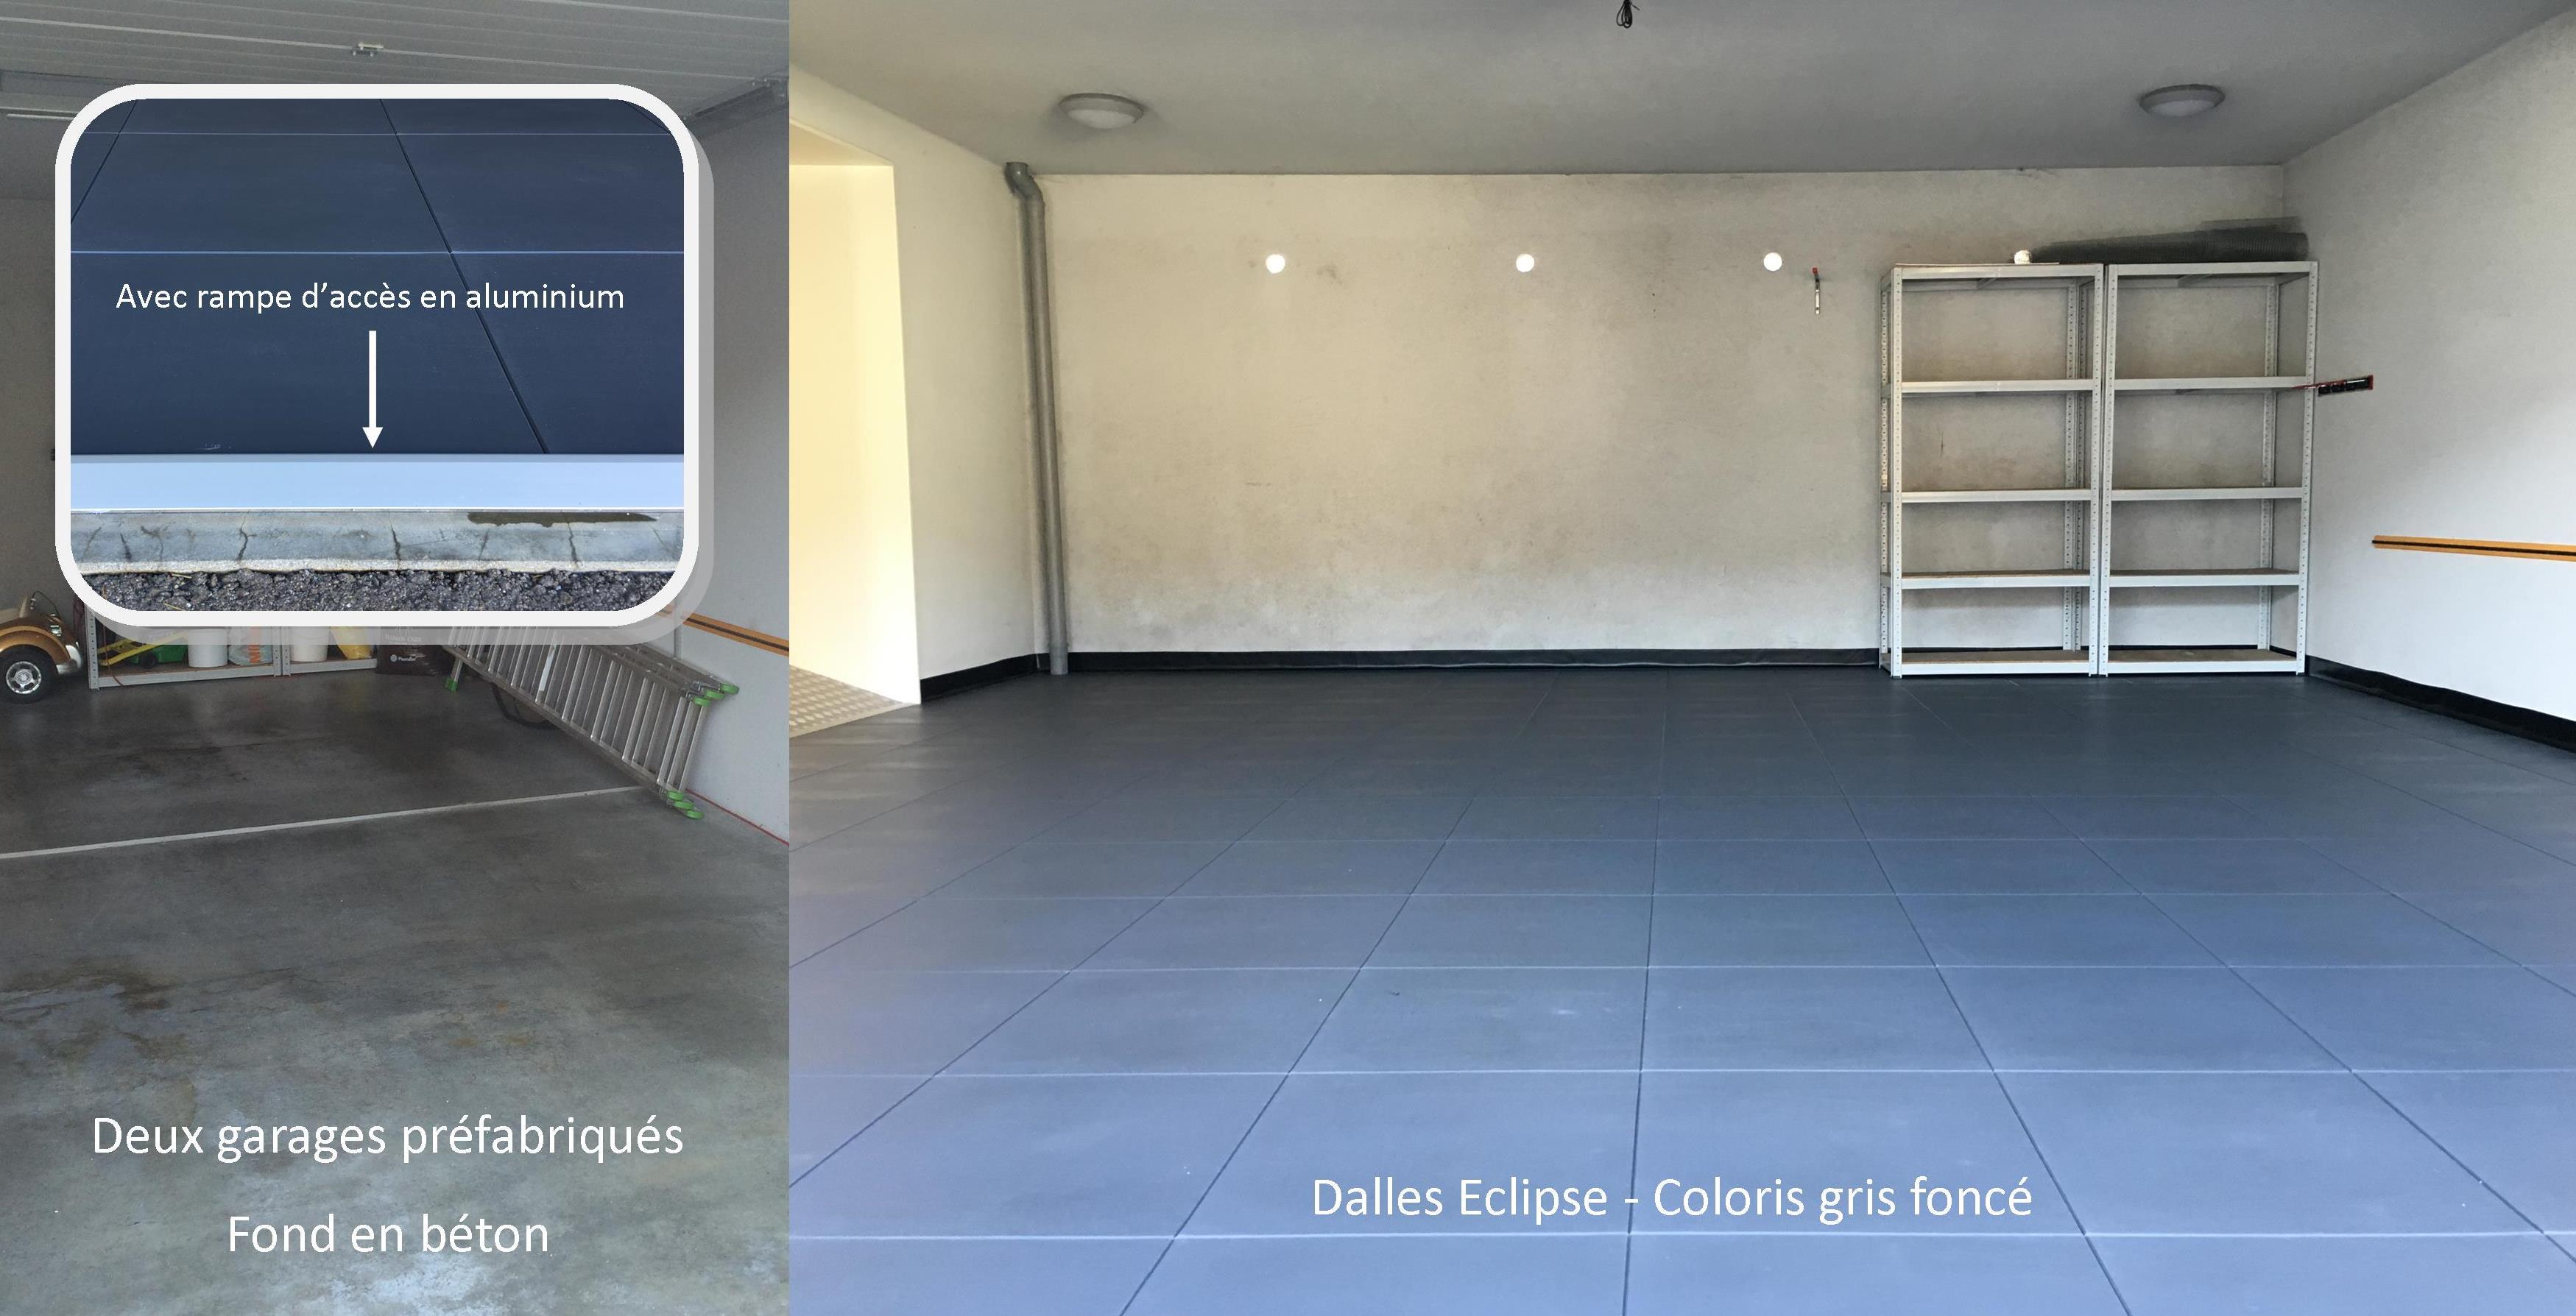 cr a sol s rl r f dalles embo tables. Black Bedroom Furniture Sets. Home Design Ideas